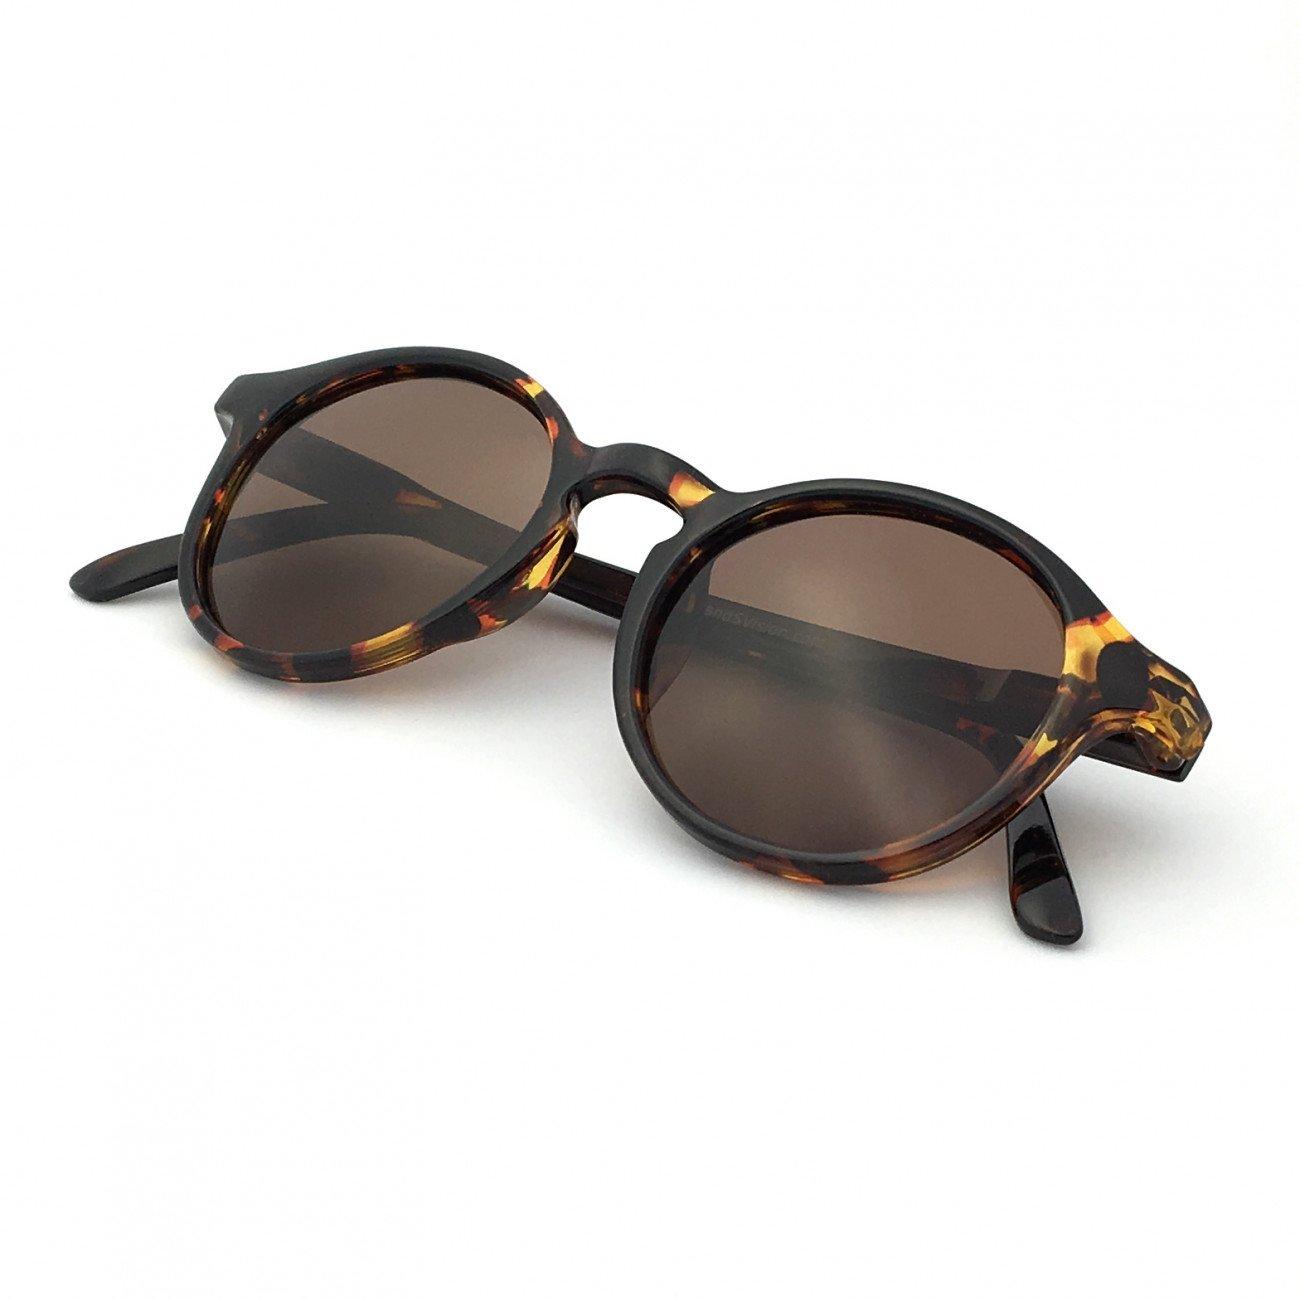 856a534fc7 J+S Hali Retro Round Sunglasses